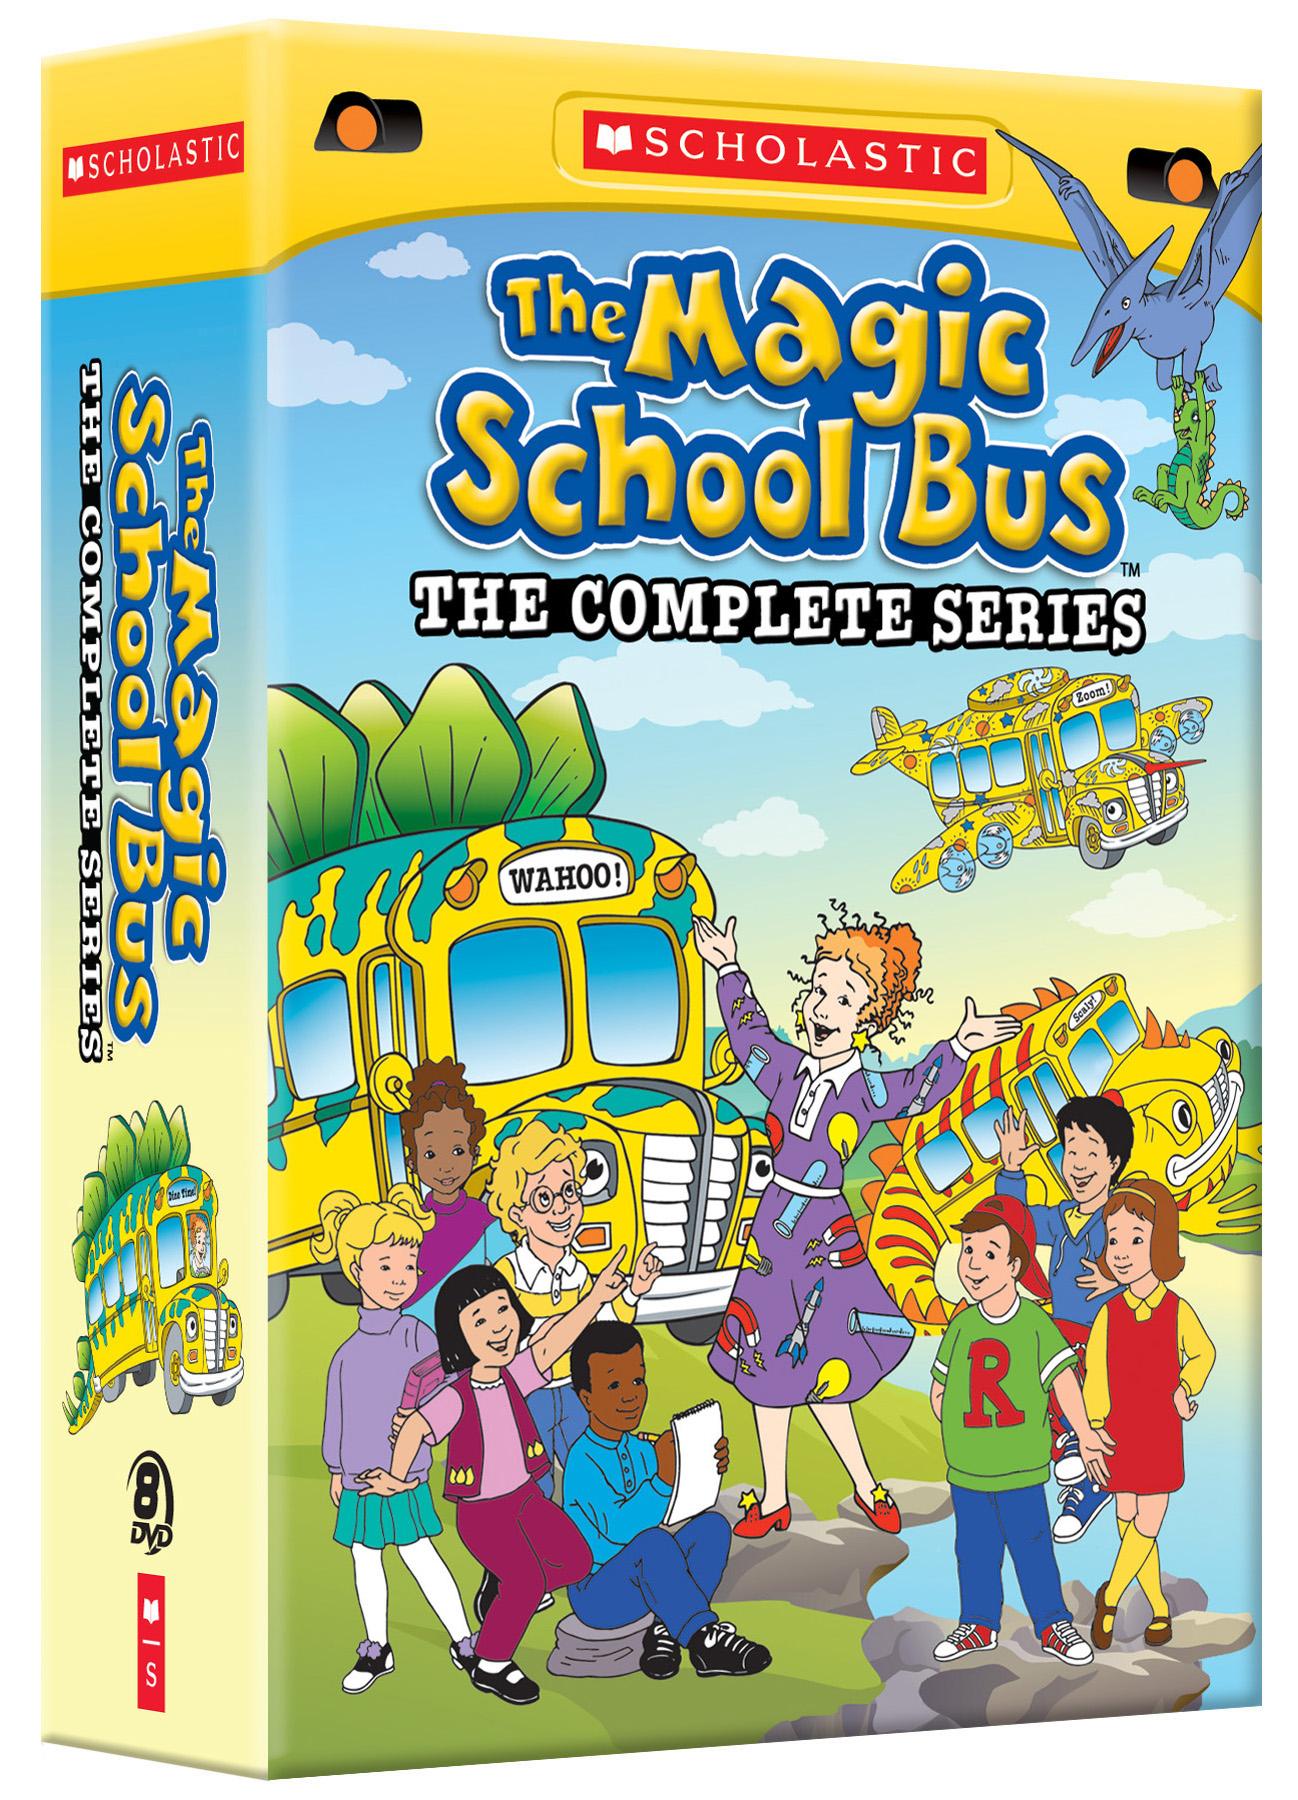 The Magic School Bus Complete Series 1 4 Dvd Boxset